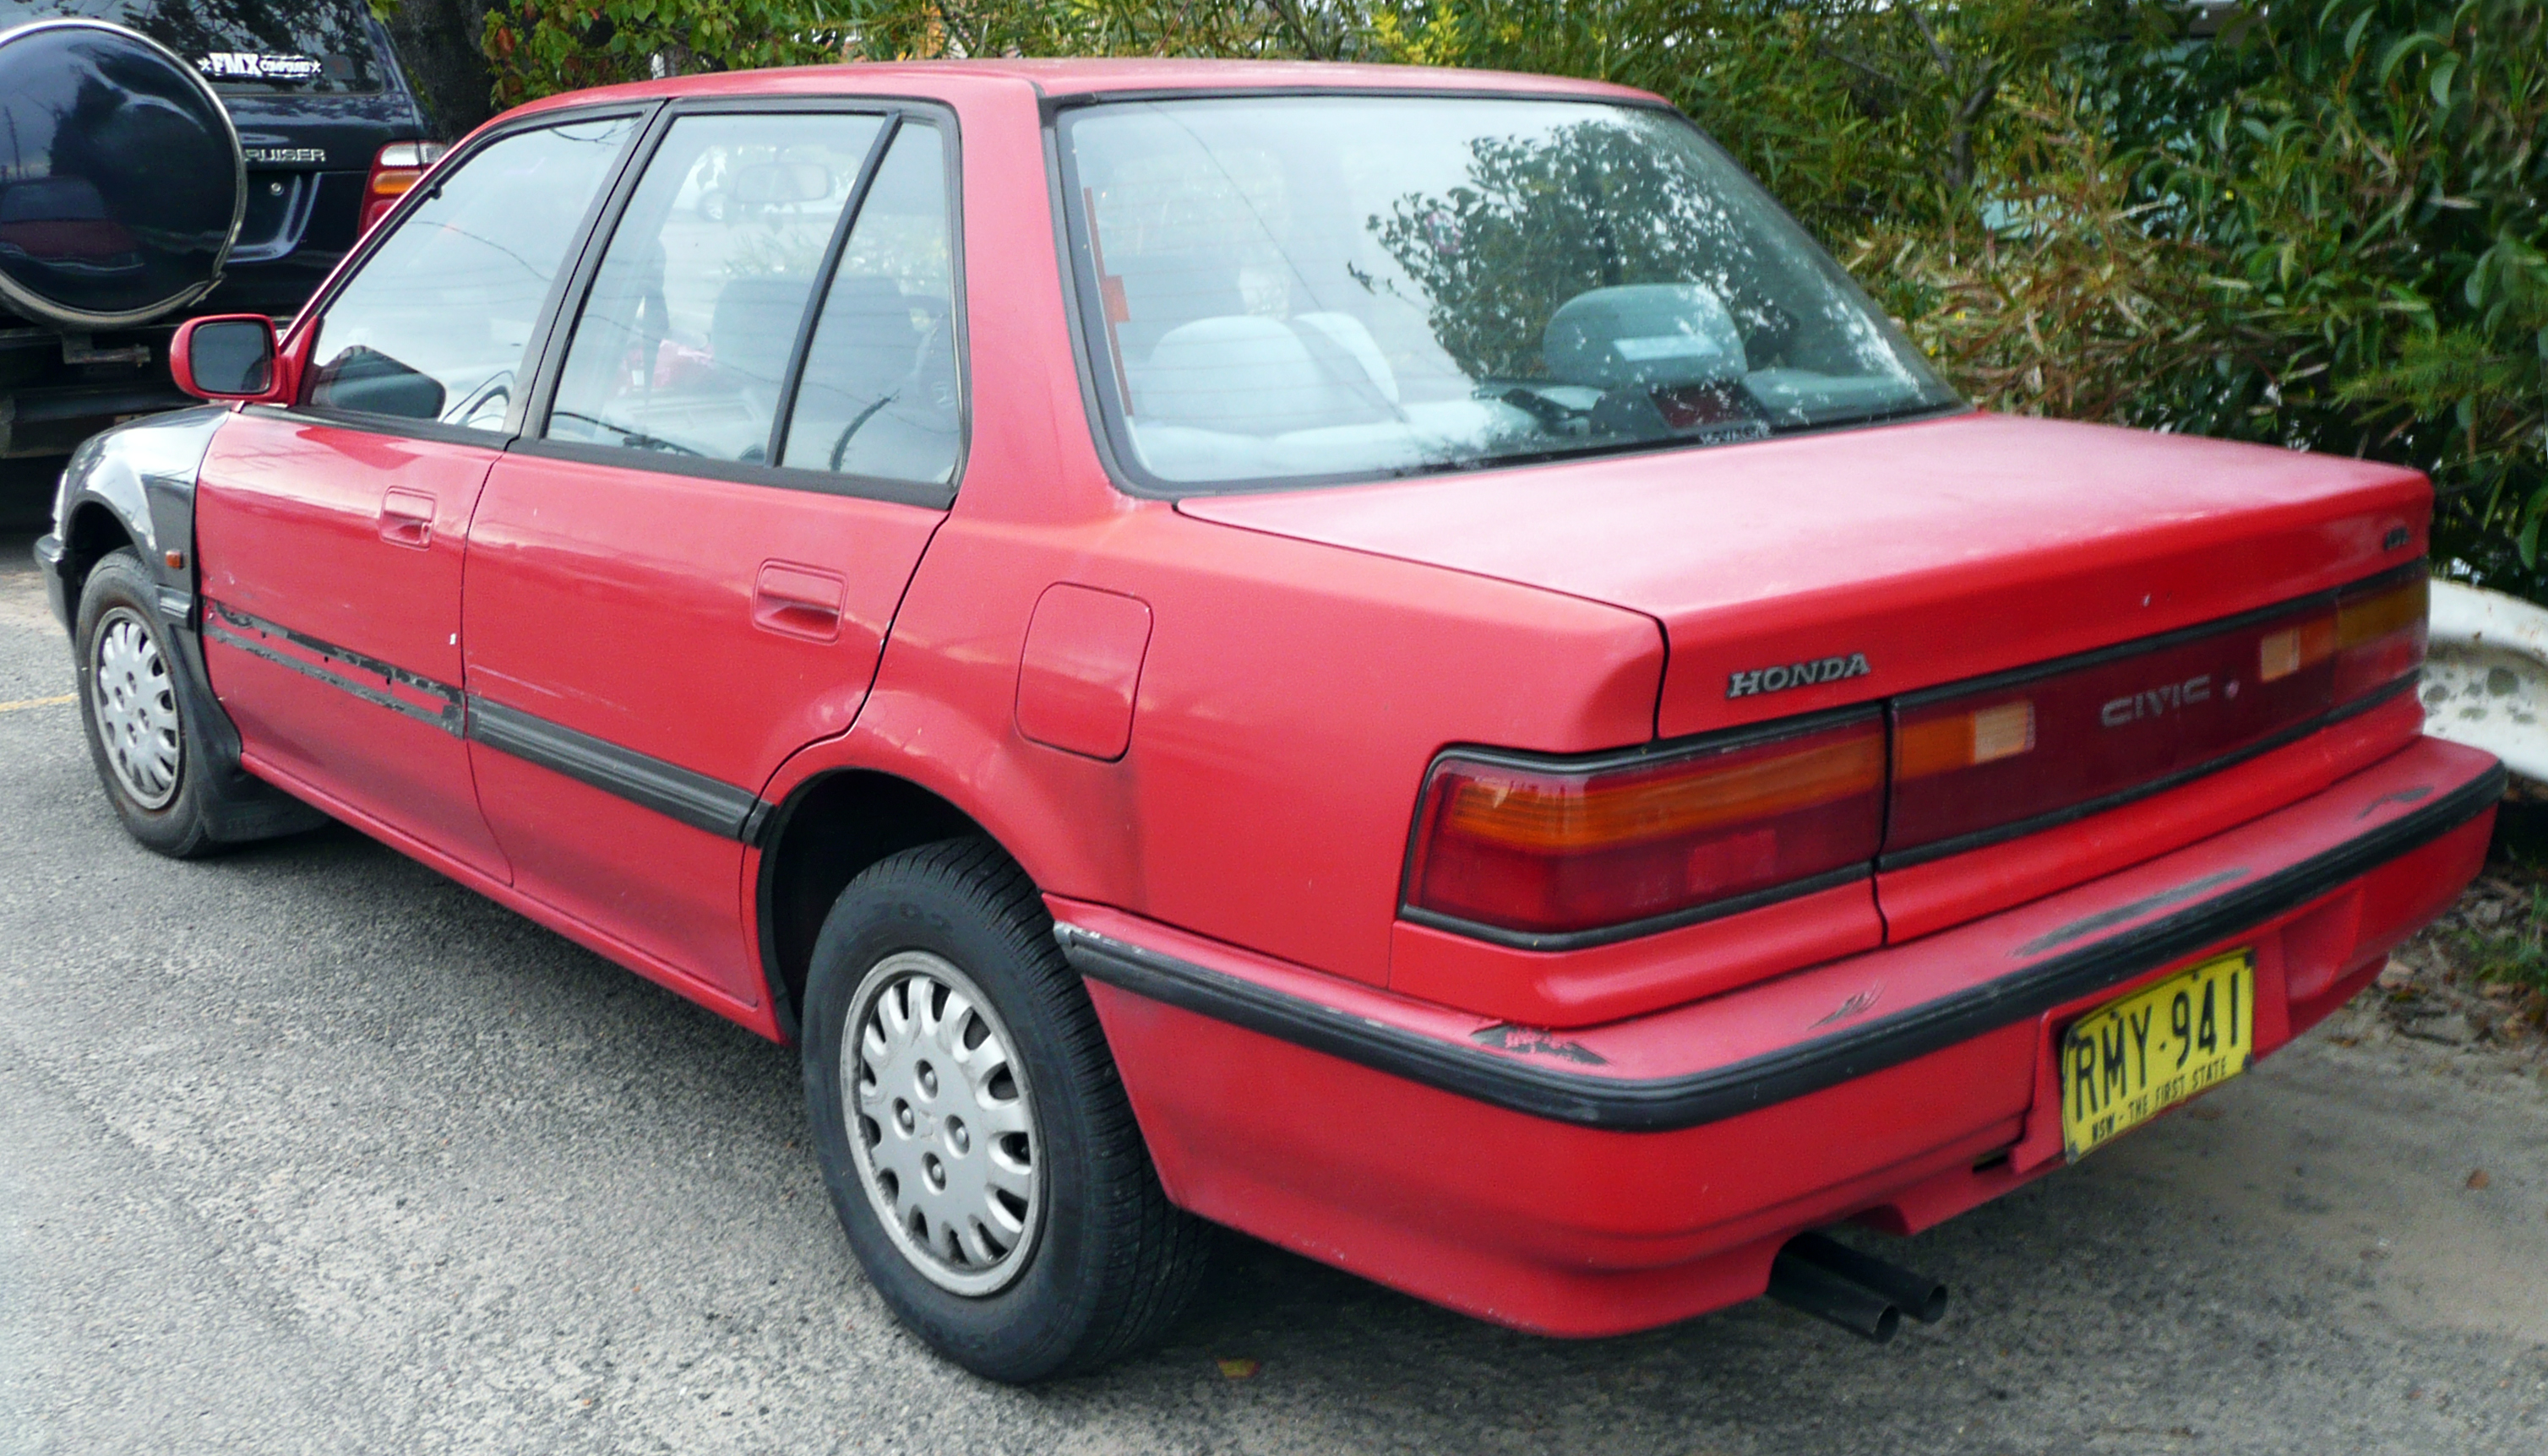 Kekurangan Honda Civic 89 Spesifikasi